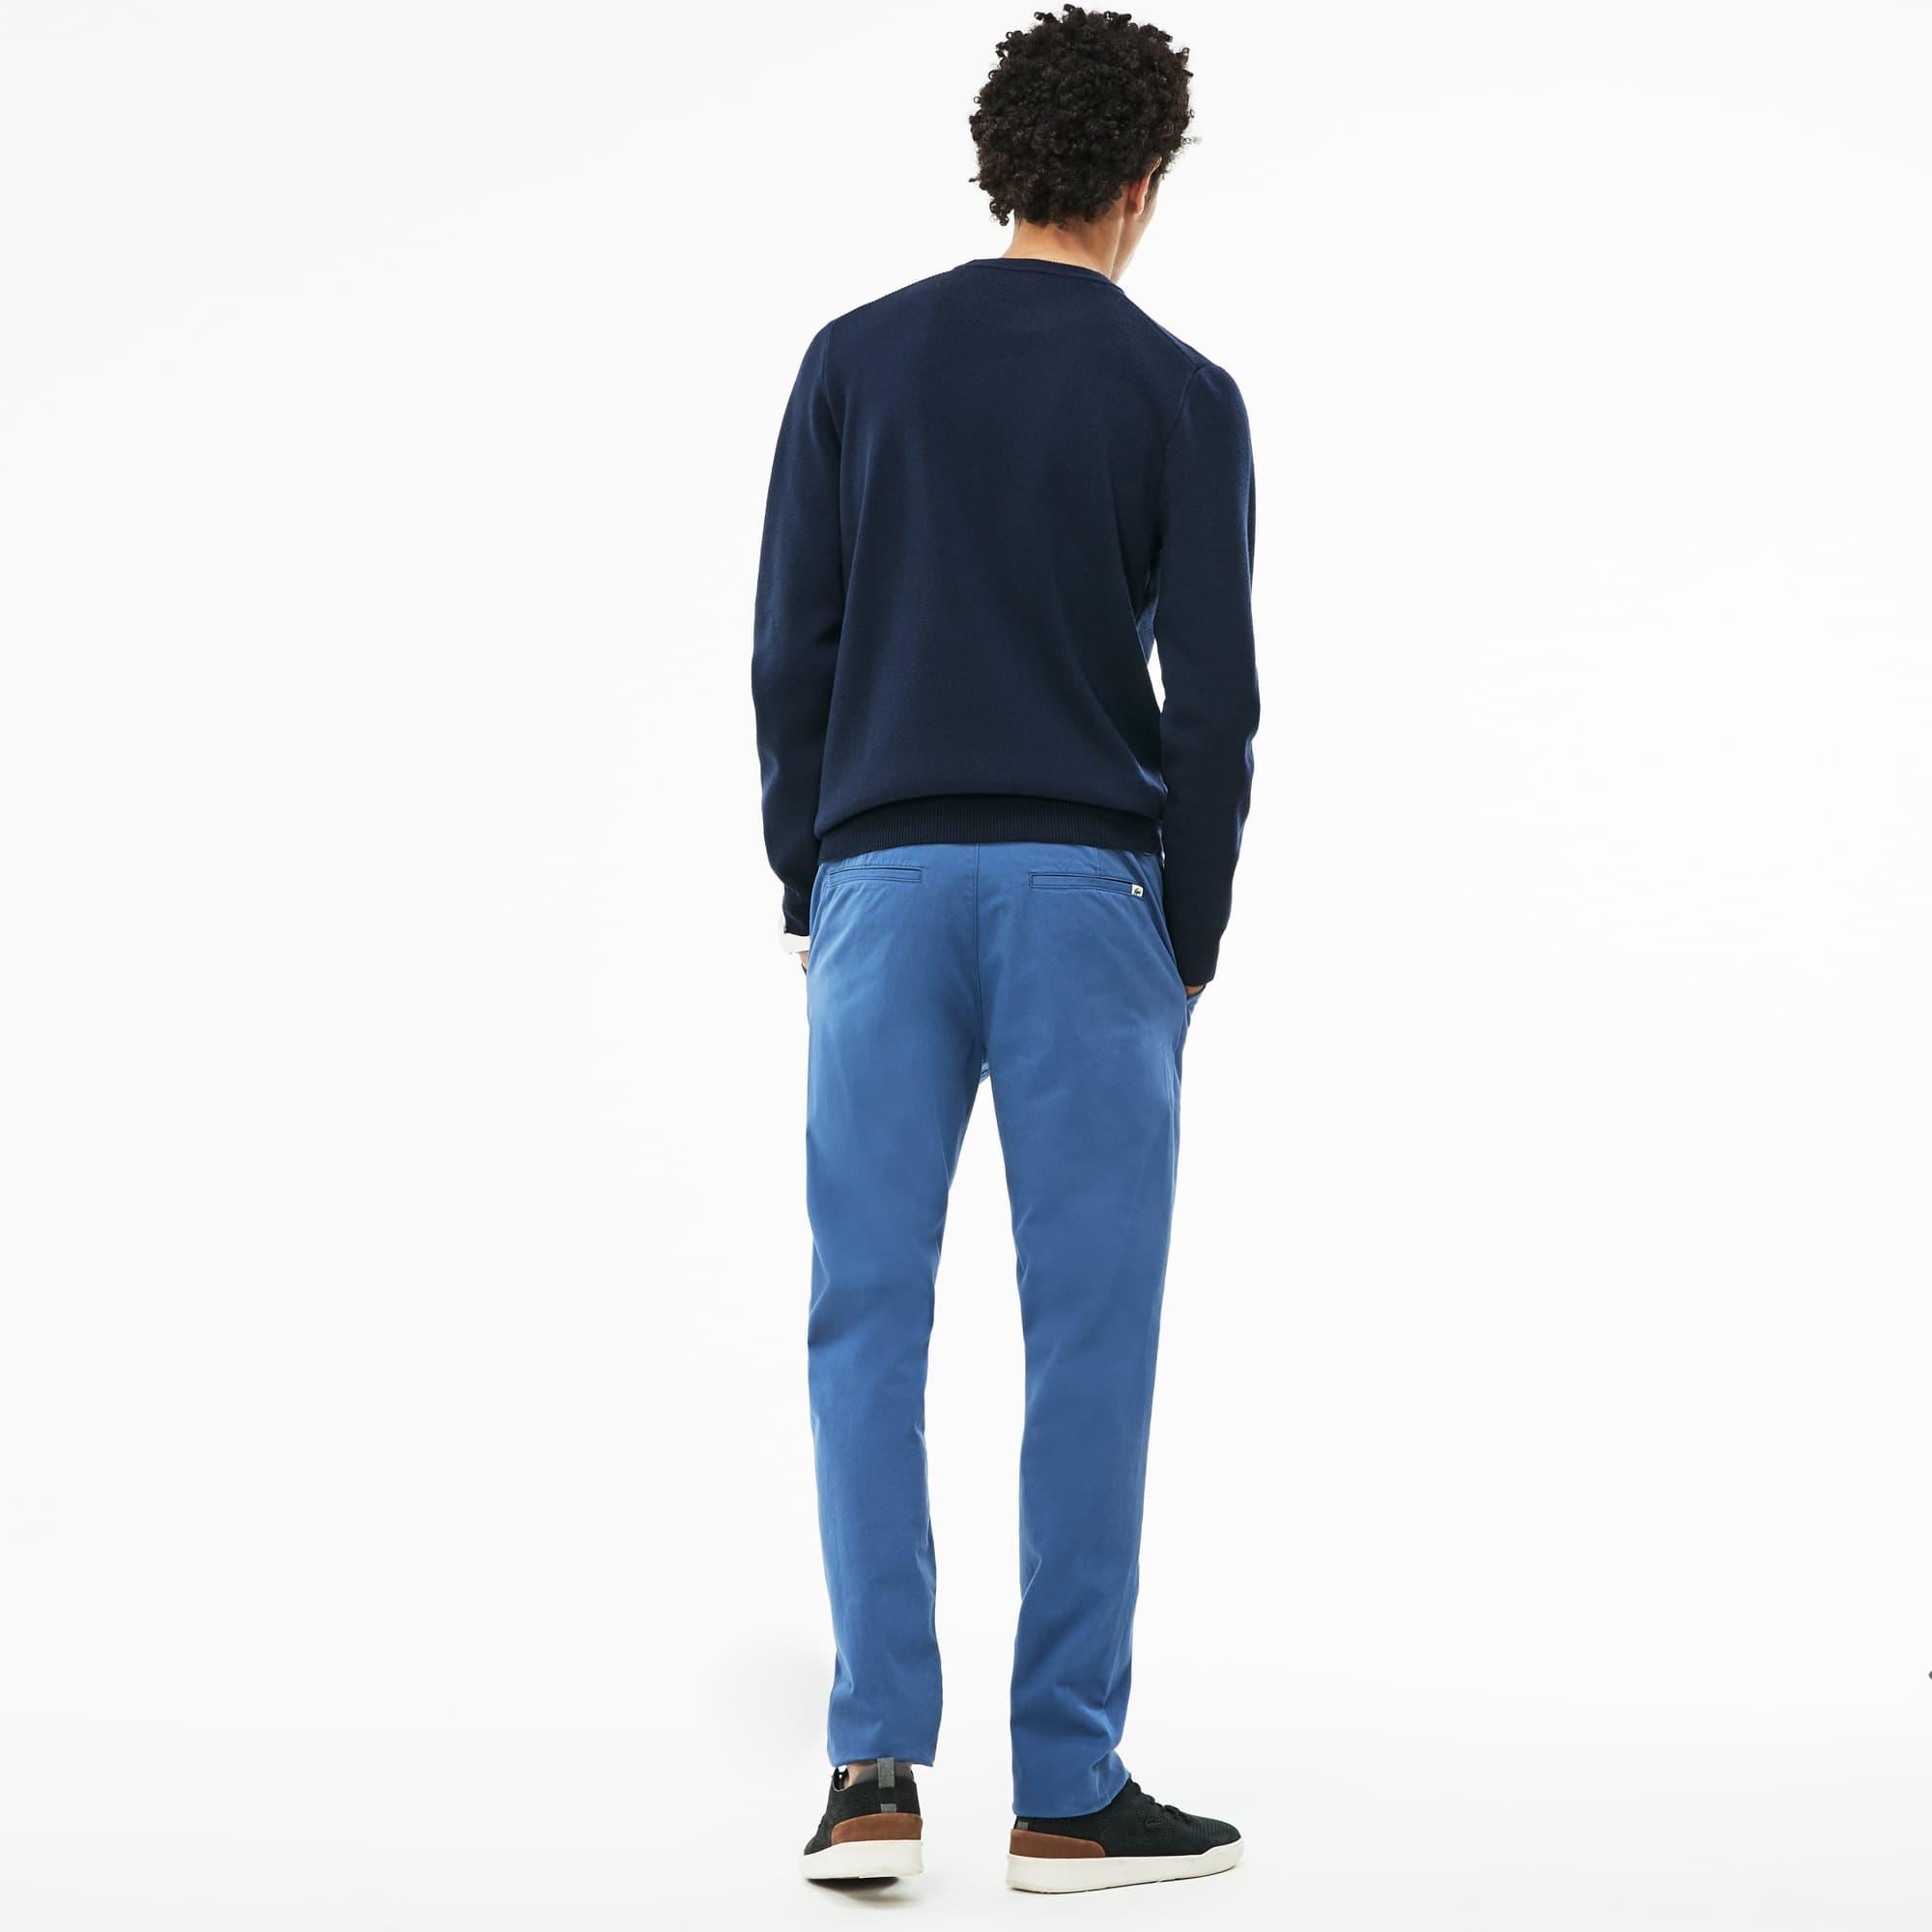 224aa265c6 Men'S Regular Fit Cotton Gabardine Chino Pants in King